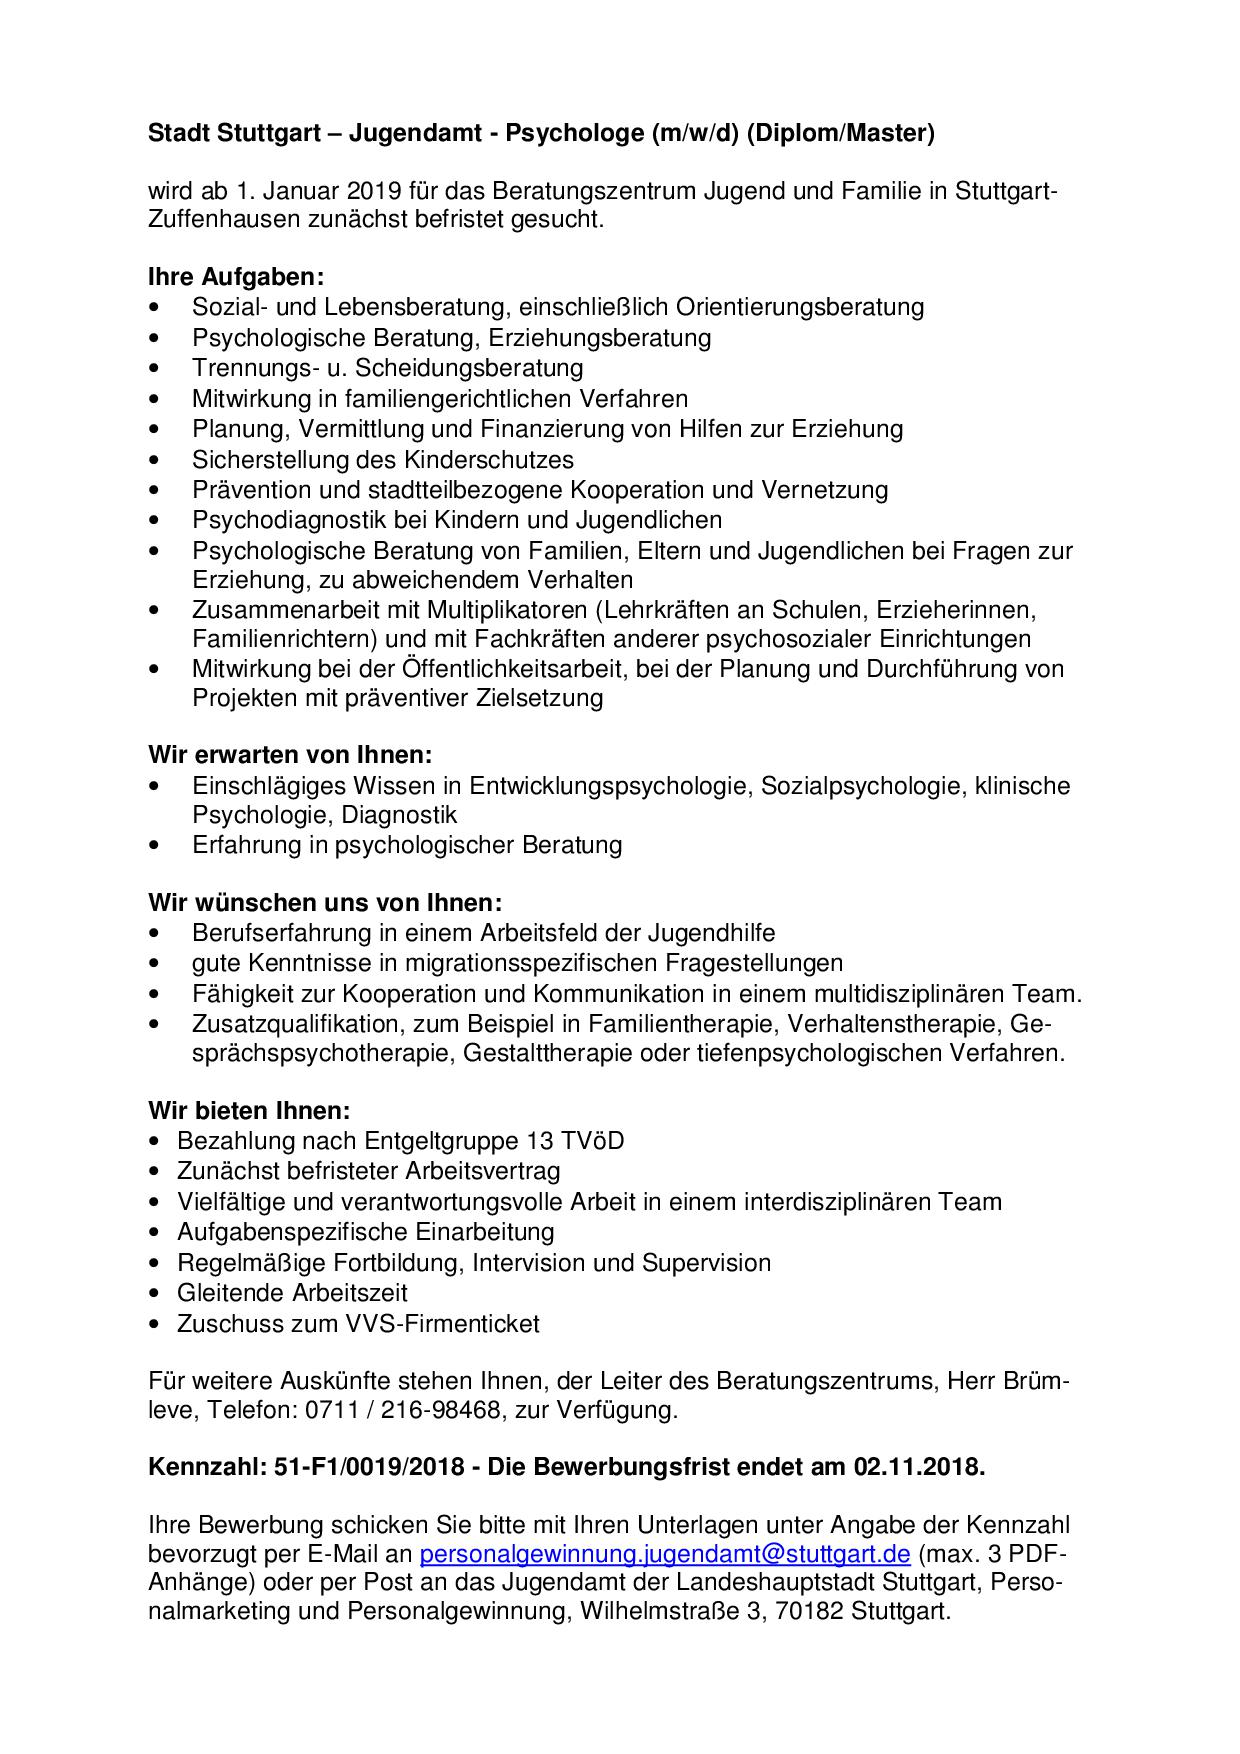 Psychologe (m/w/d) - Stuttgart   PsychJOB